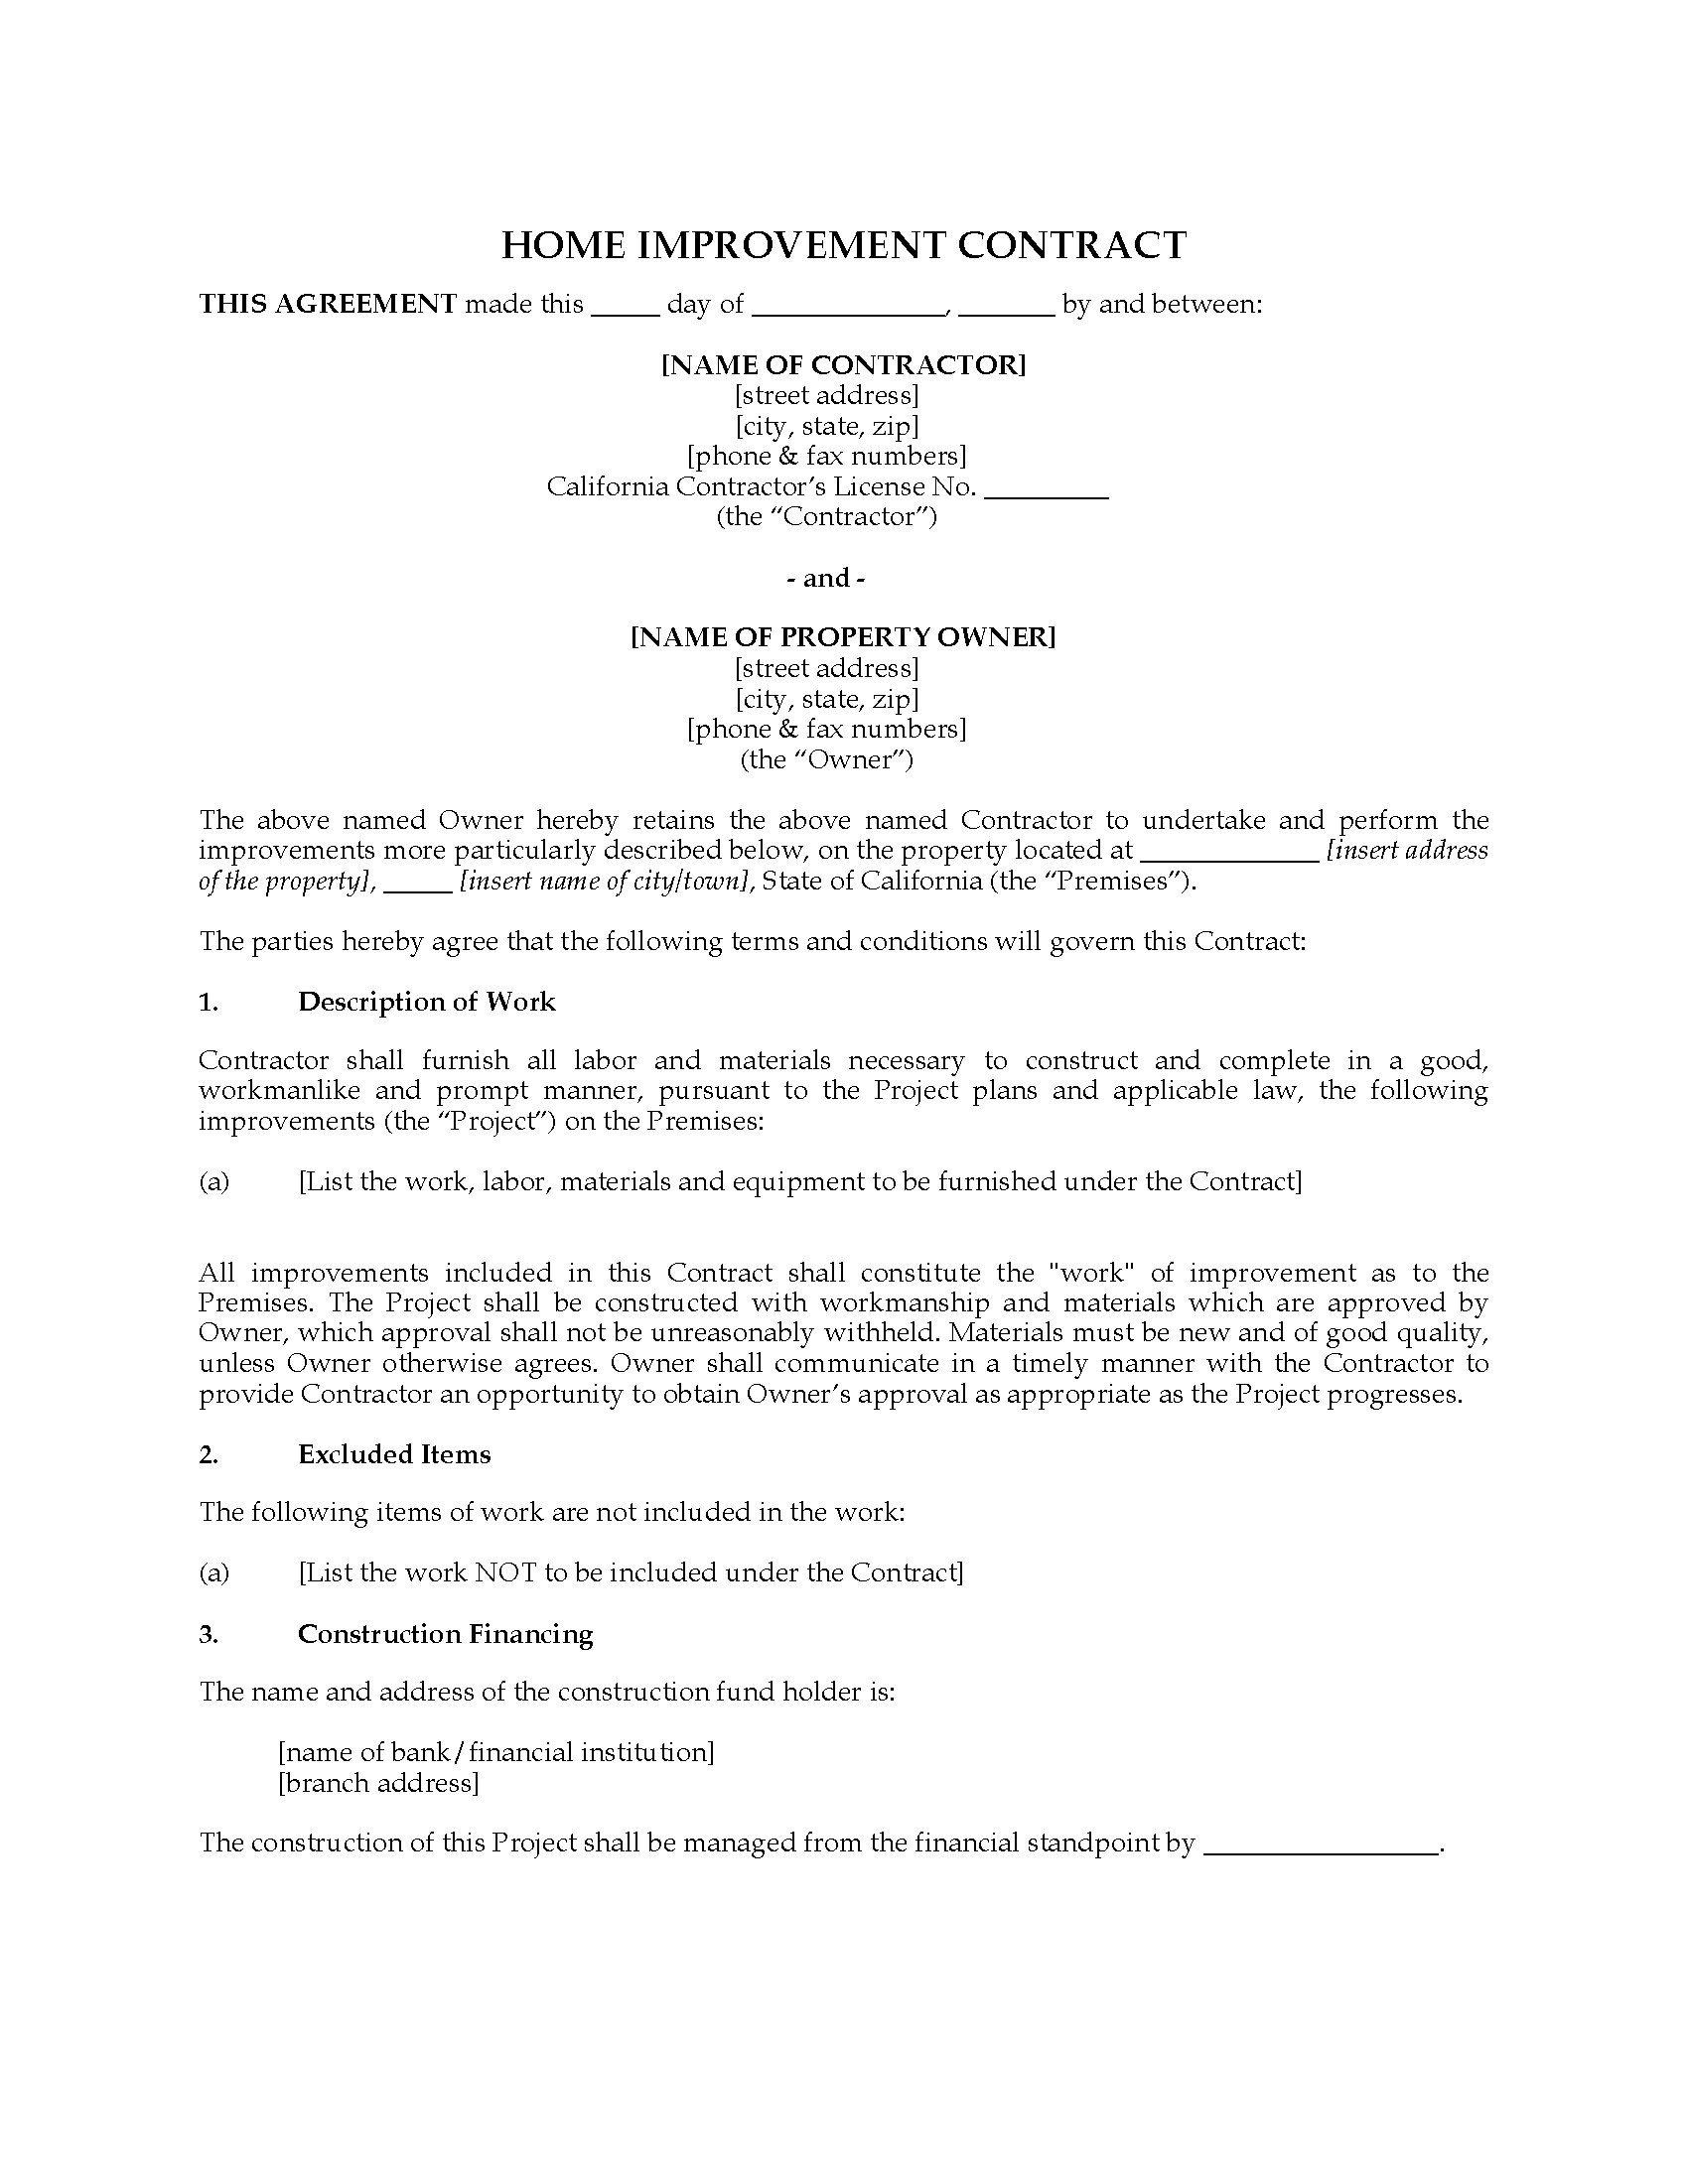 California Home Improvement Contract Template California Home Improvement Contract